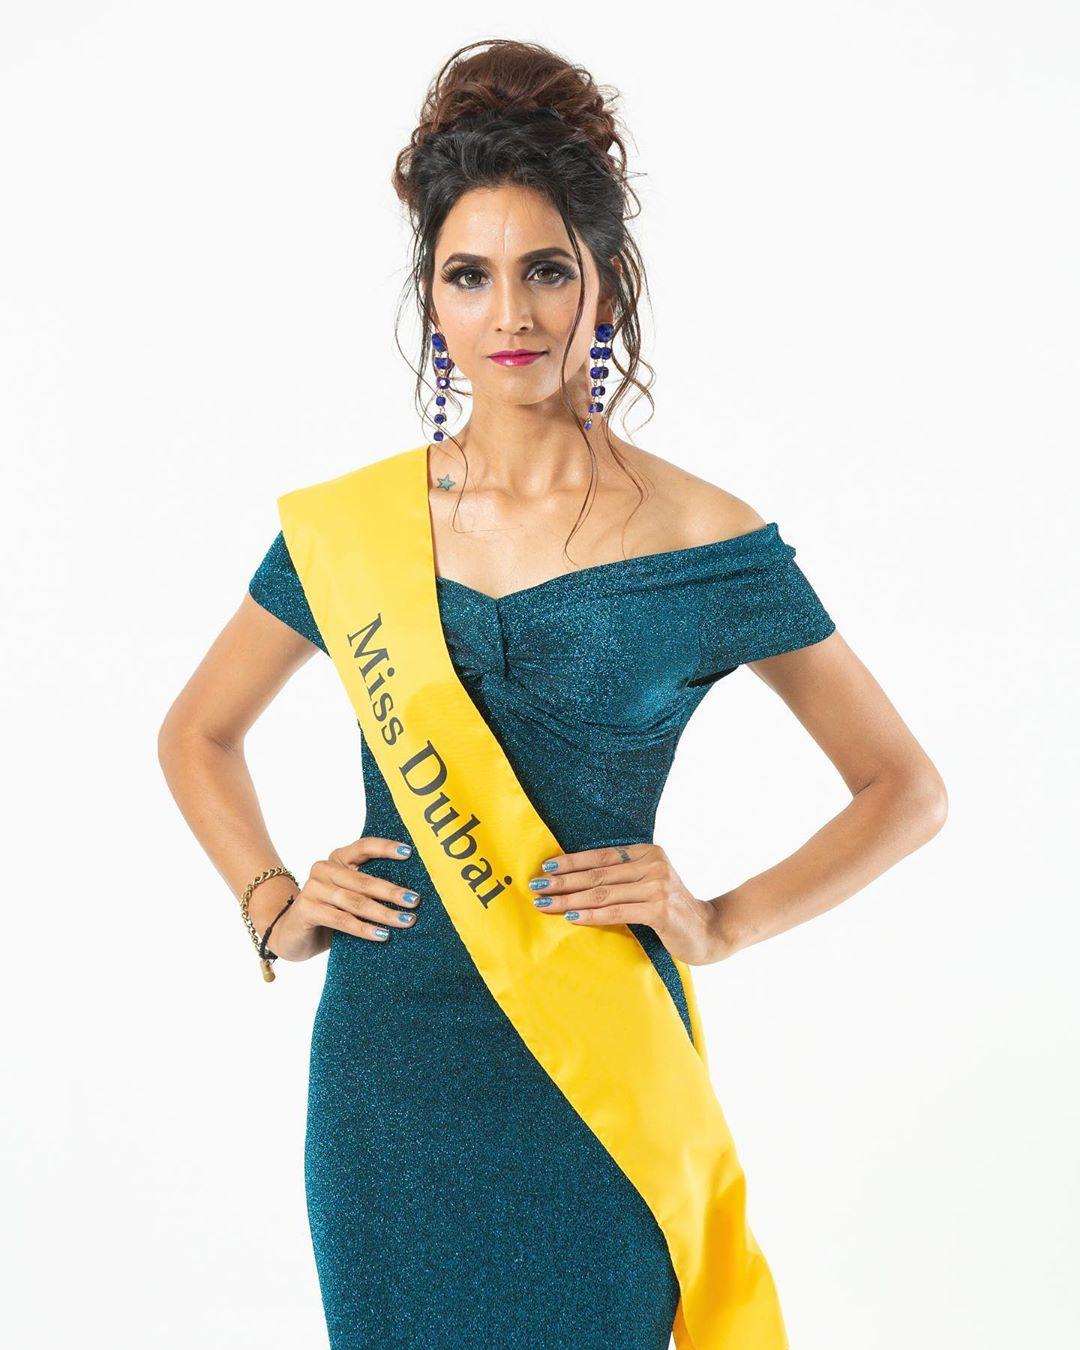 miss latvia vence miss great 2019. 1kO5W4